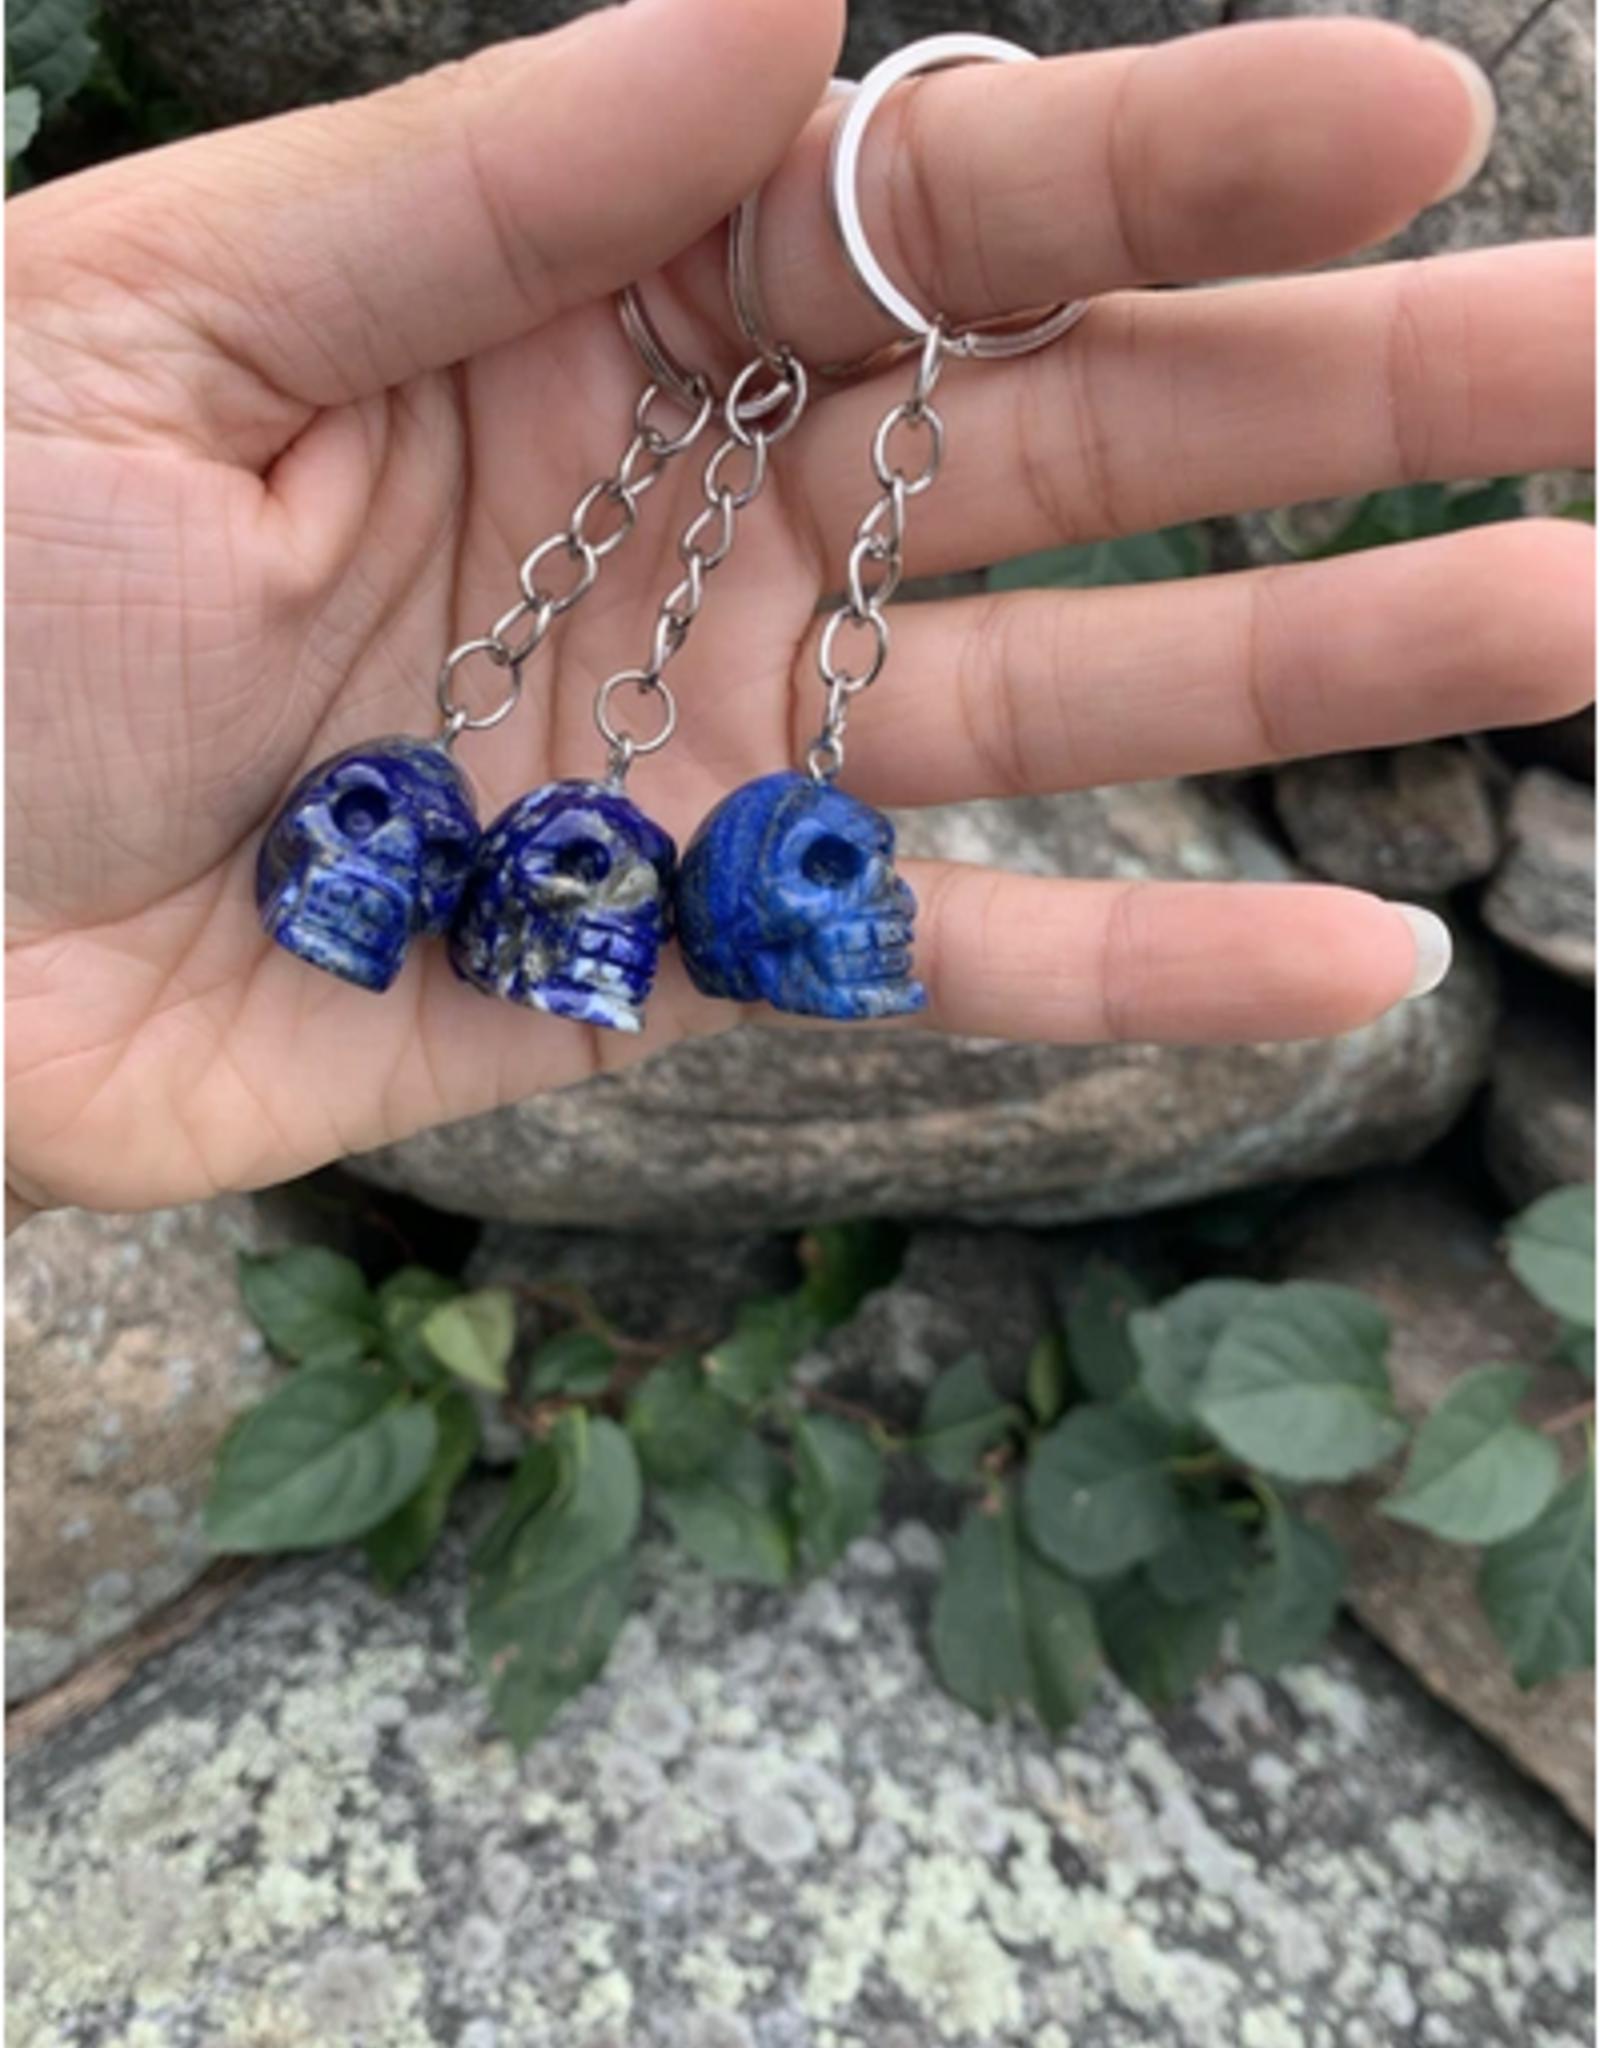 Pelham Grayson Crystal Skull Keychain